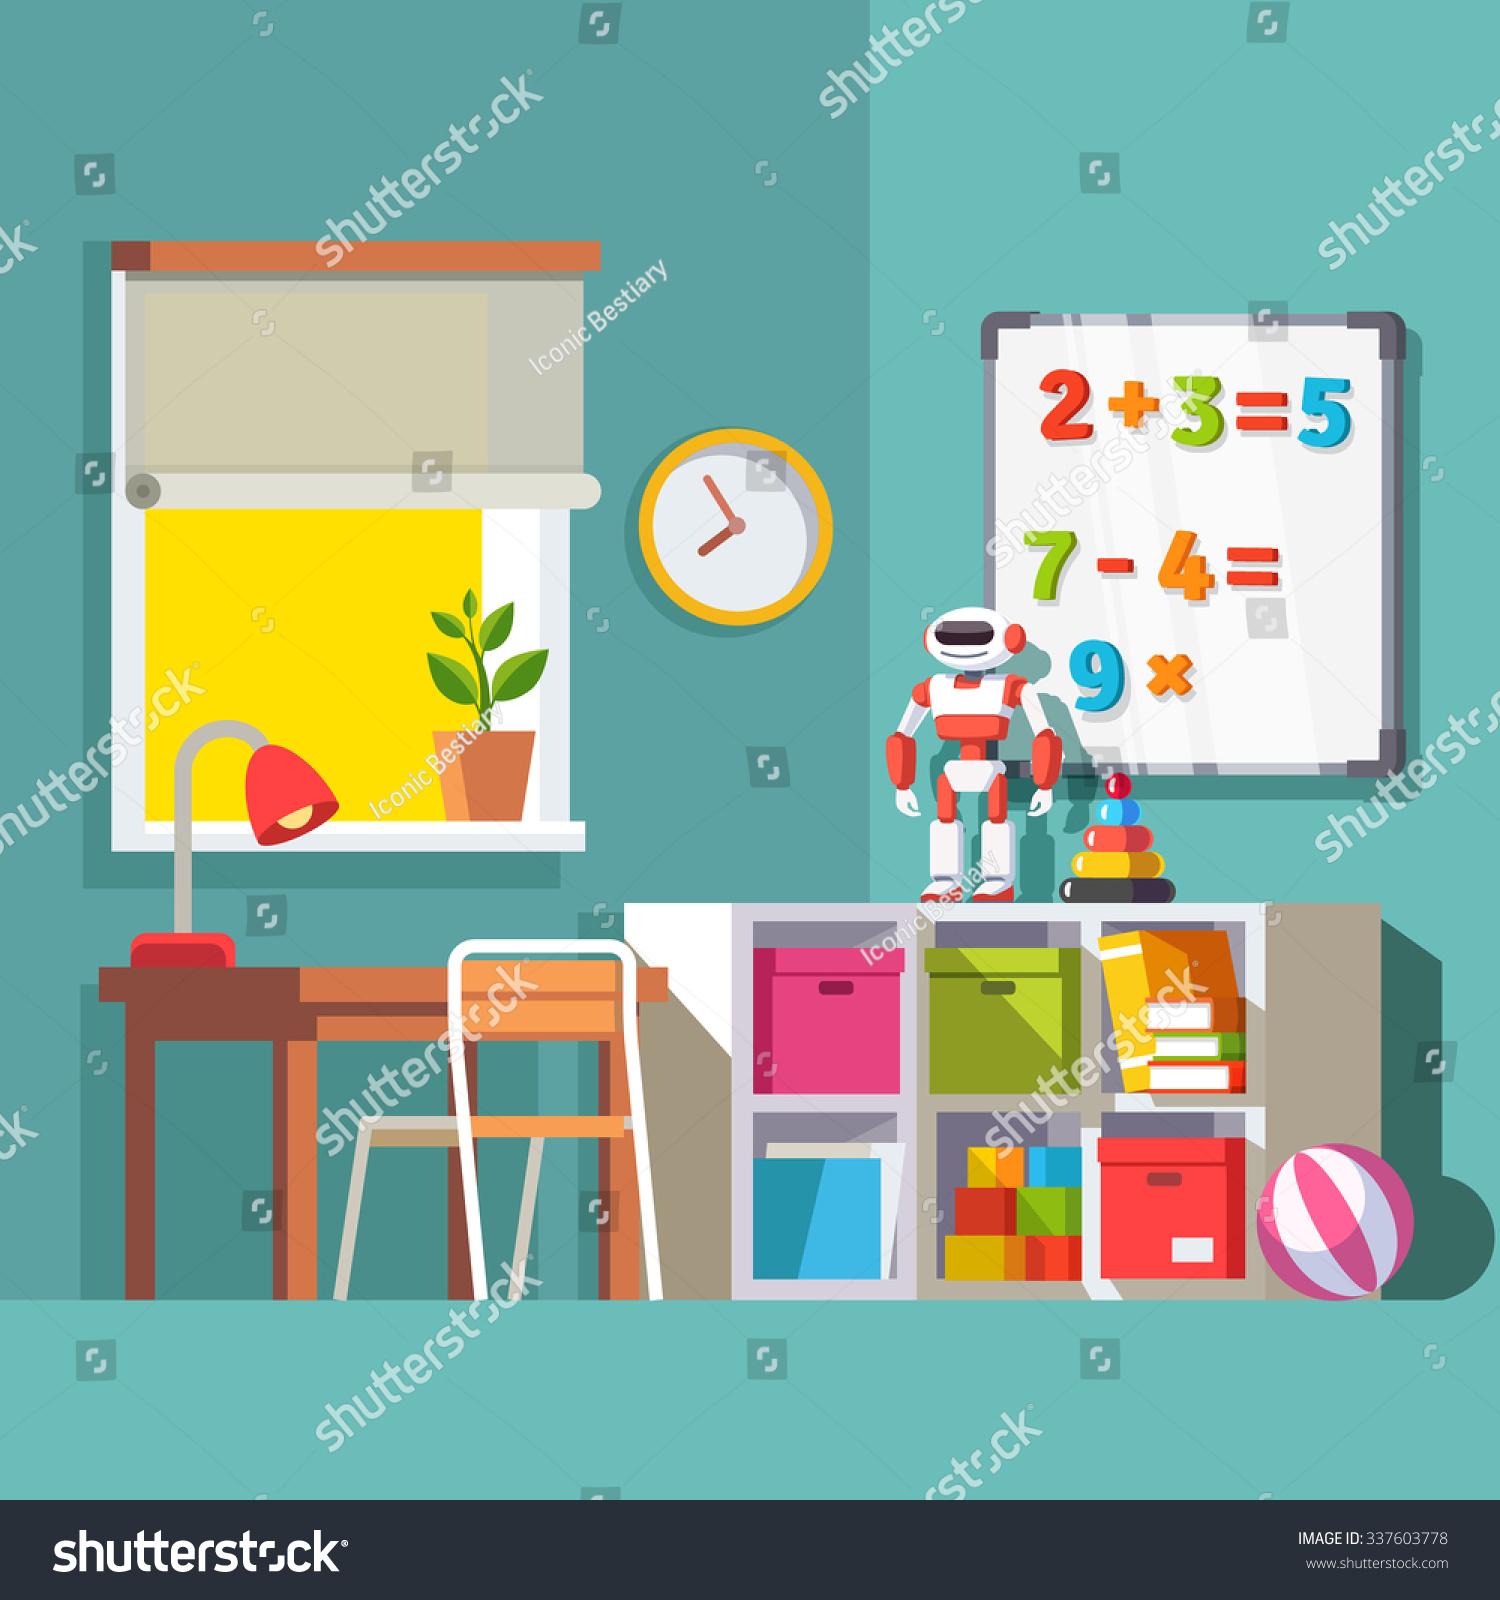 preschool or school student kid room interior study desk at the window storage combination